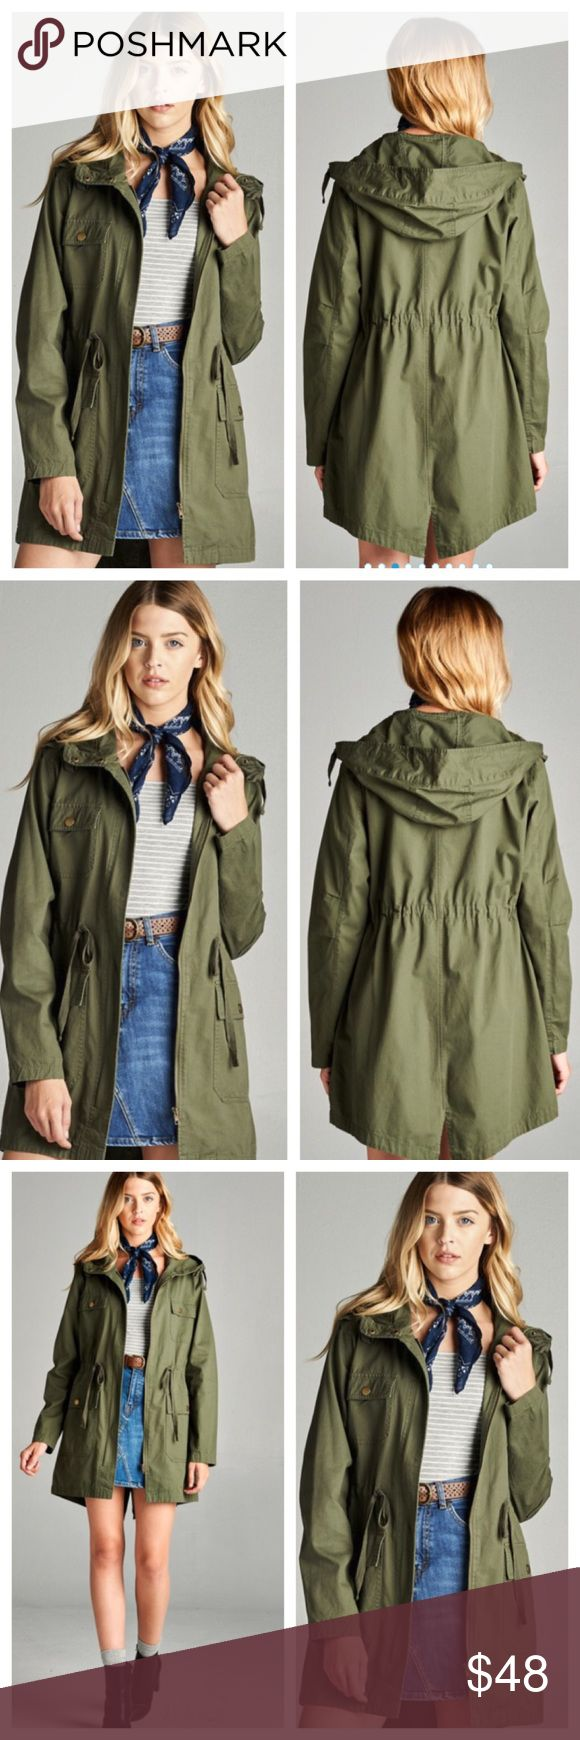 ‼️C0MING SOON‼️ Olive Utility Jacket Brand New, Olive Utility jacket. Jackets & Coats Utility Jackets